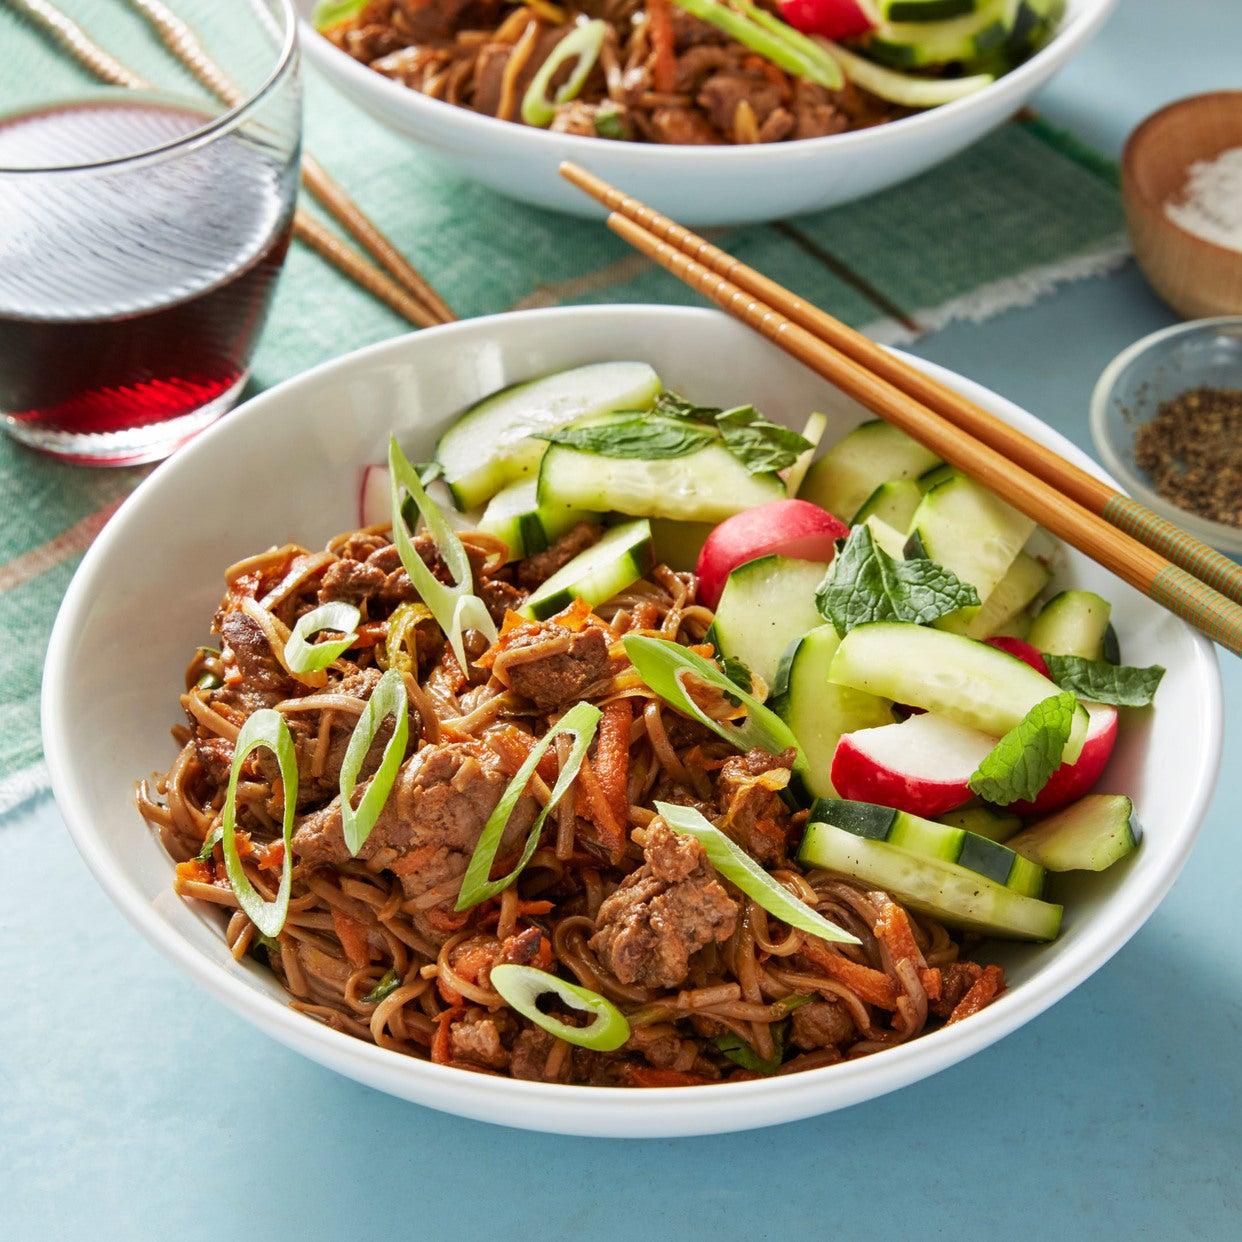 Bulgogi Beef & Soba Noodle Stir-Fry with Marinated Vegetables